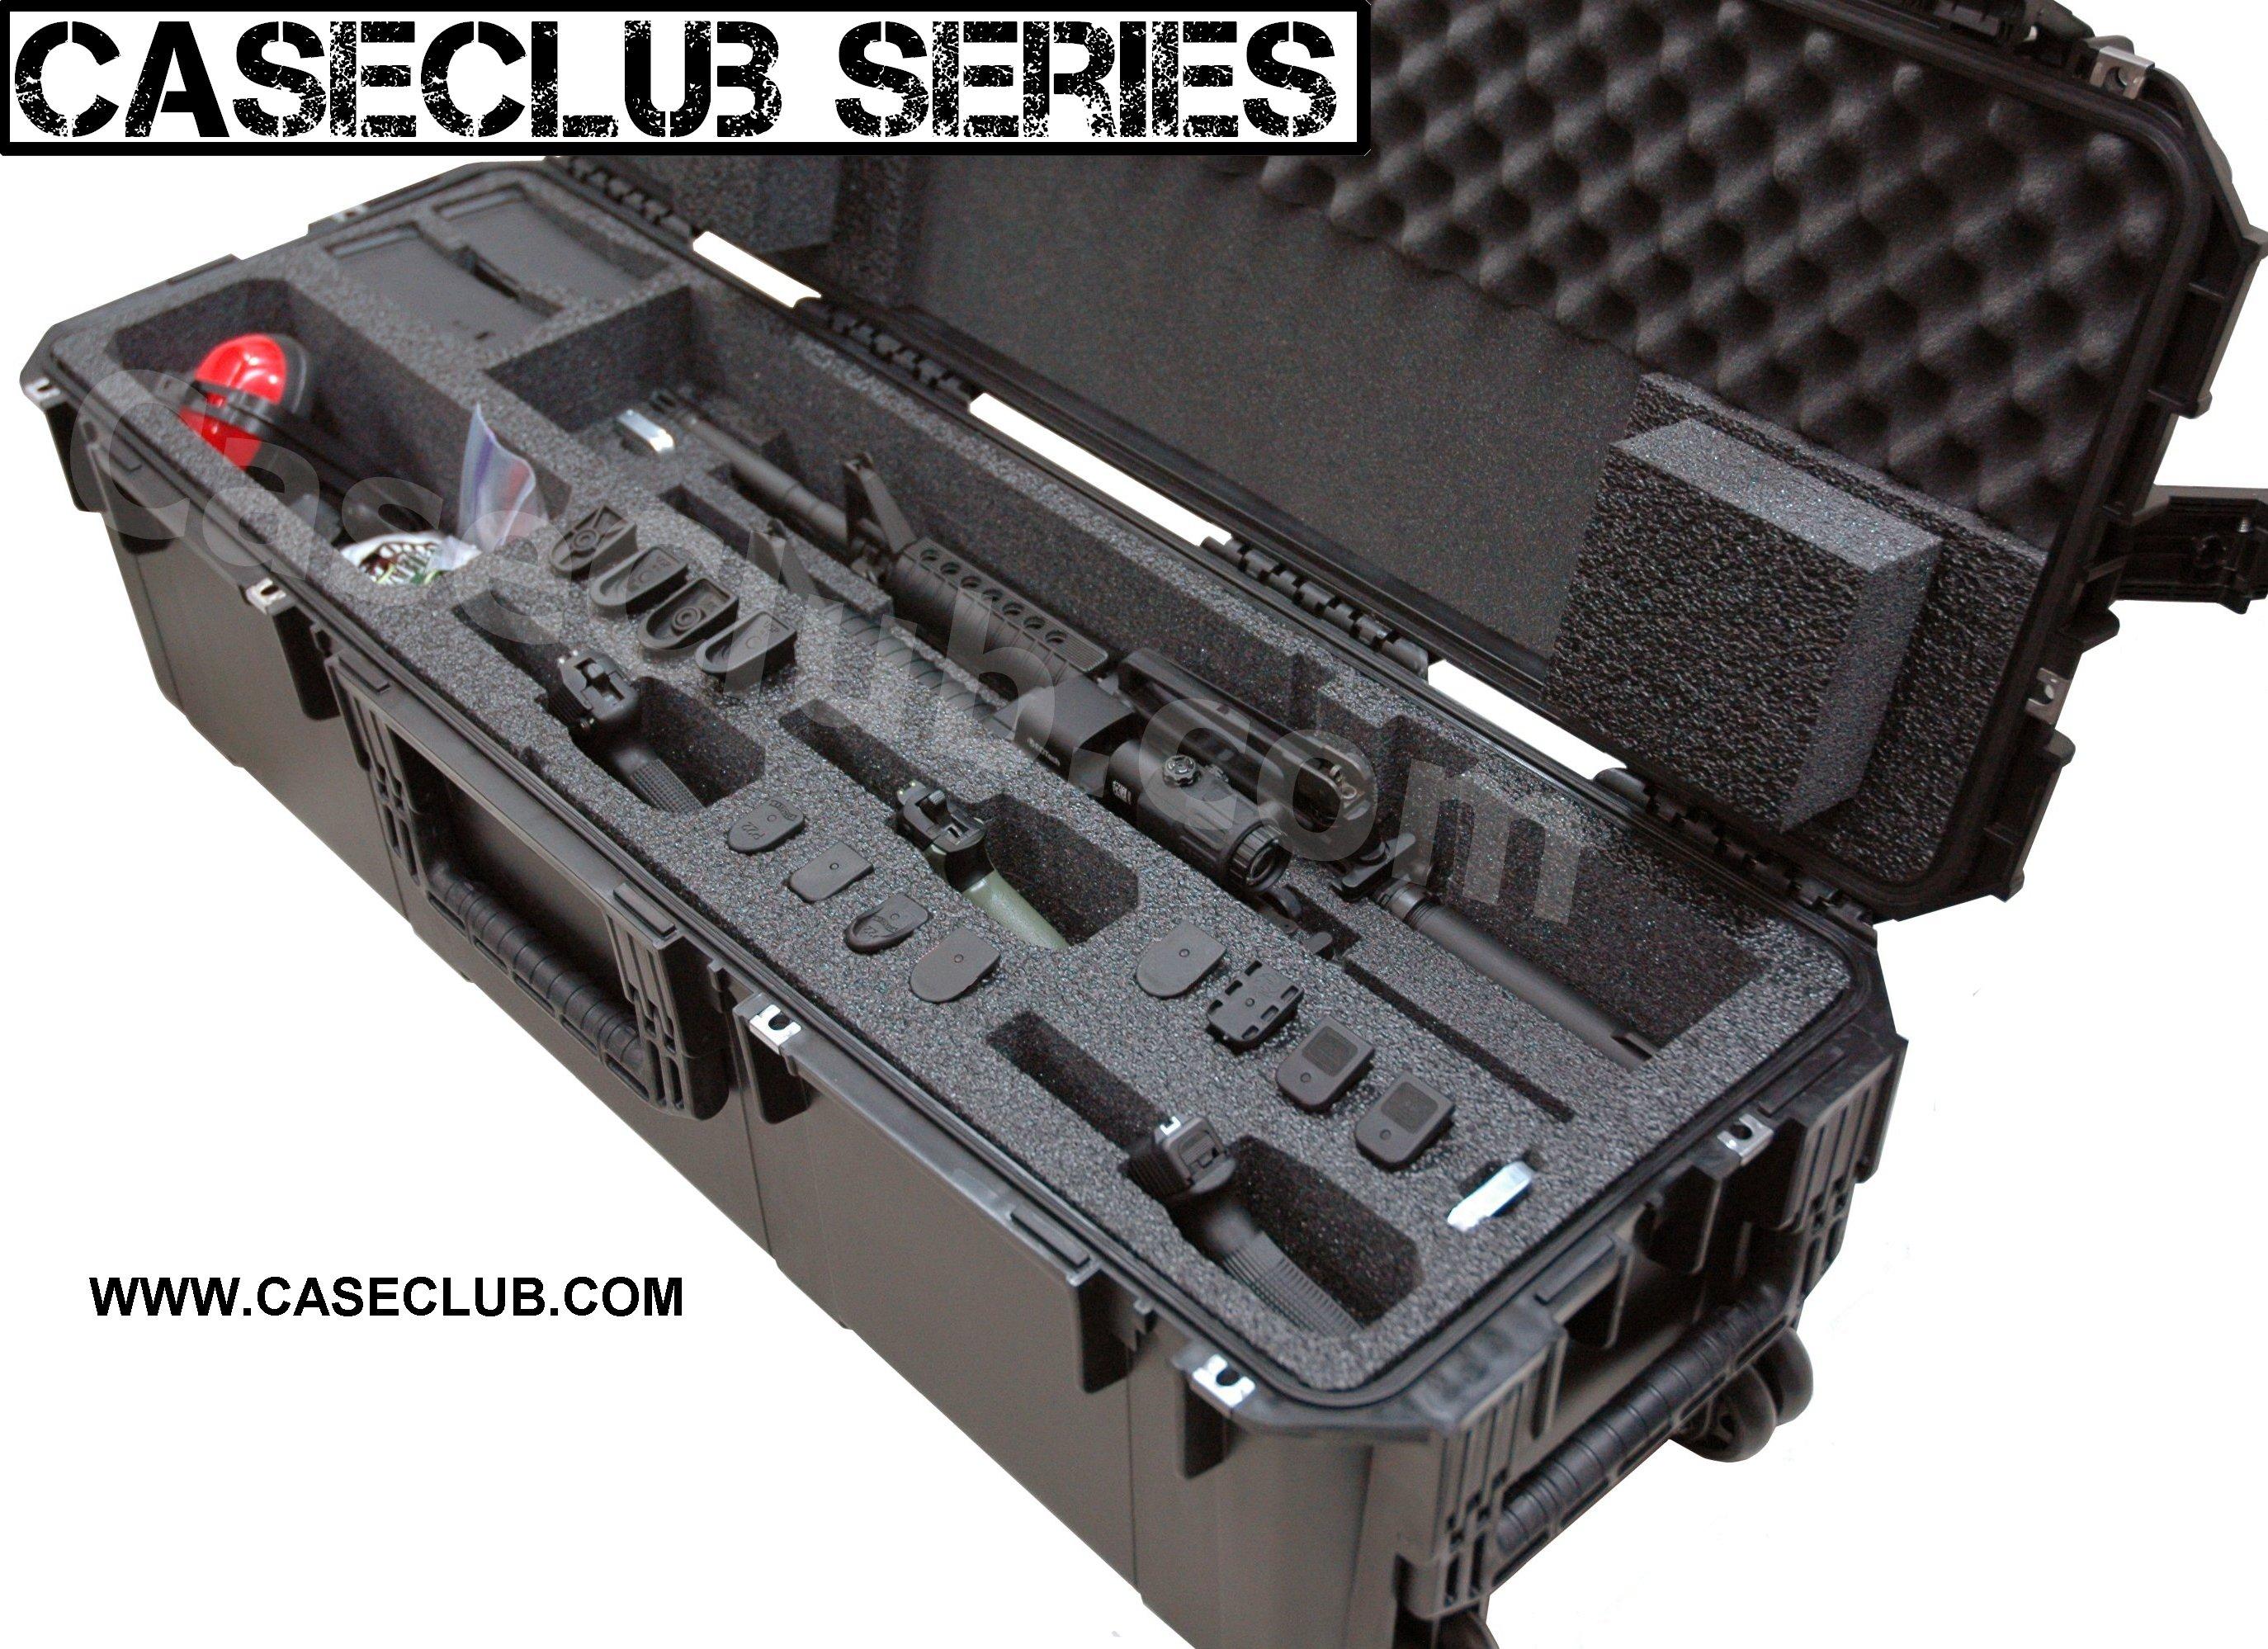 2 Ar15 Rifle Amp 3 Pistol Case Multiple Rifle Shotgun